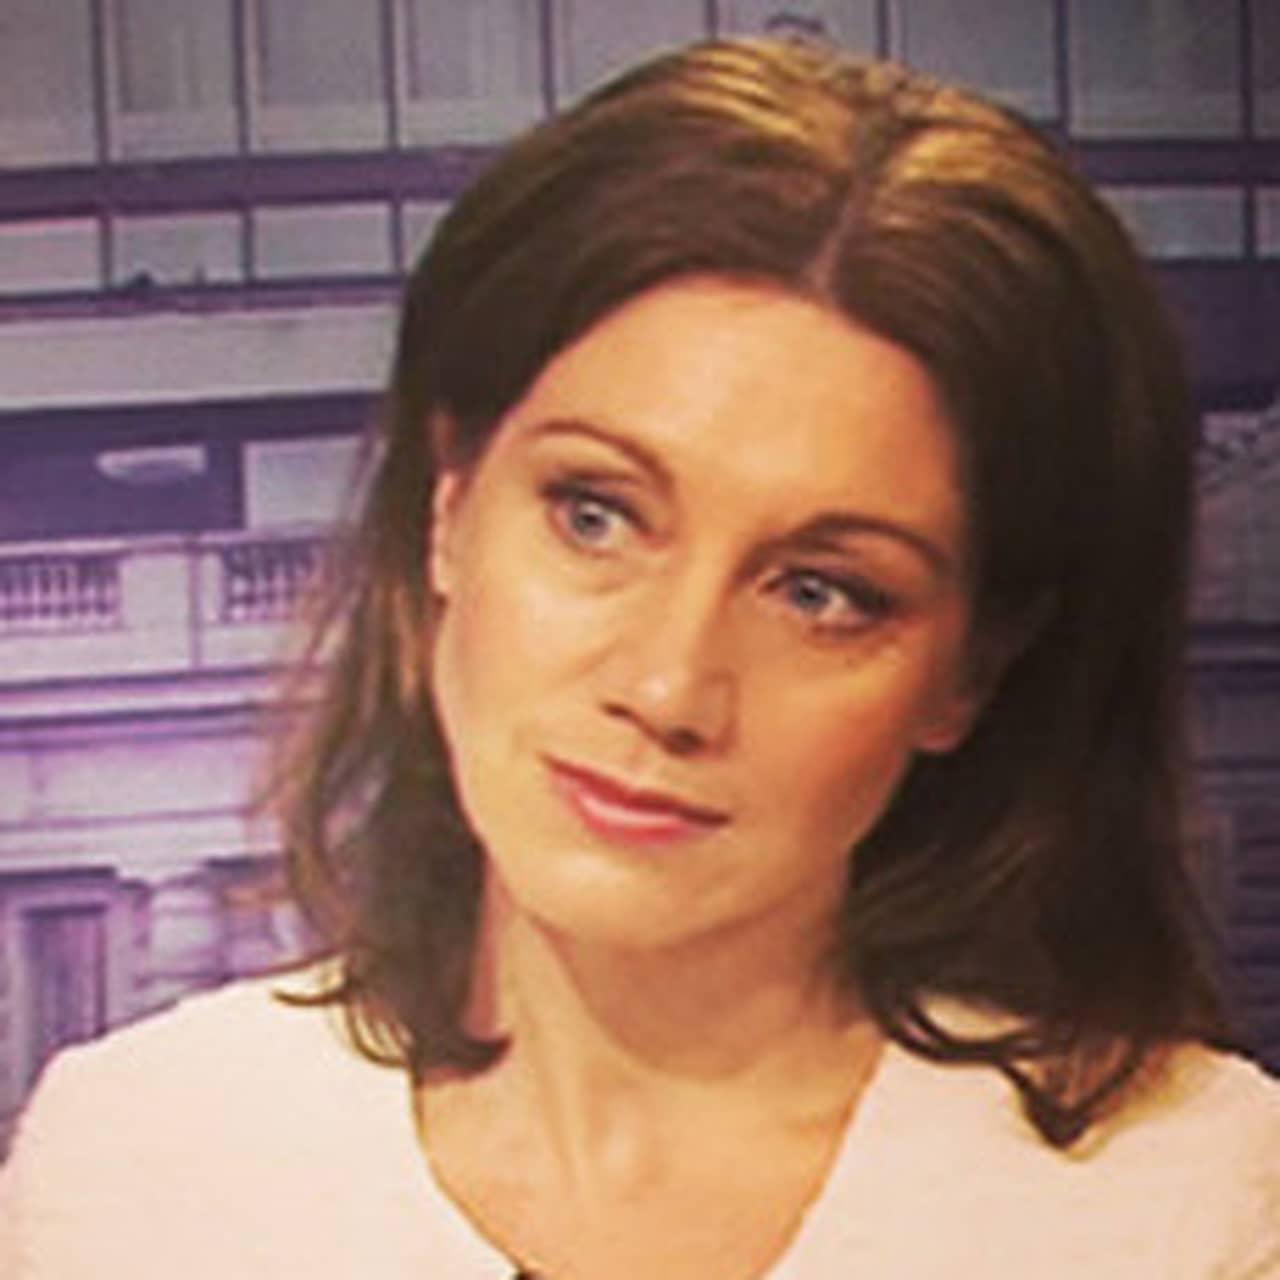 57. Katarina Barrling